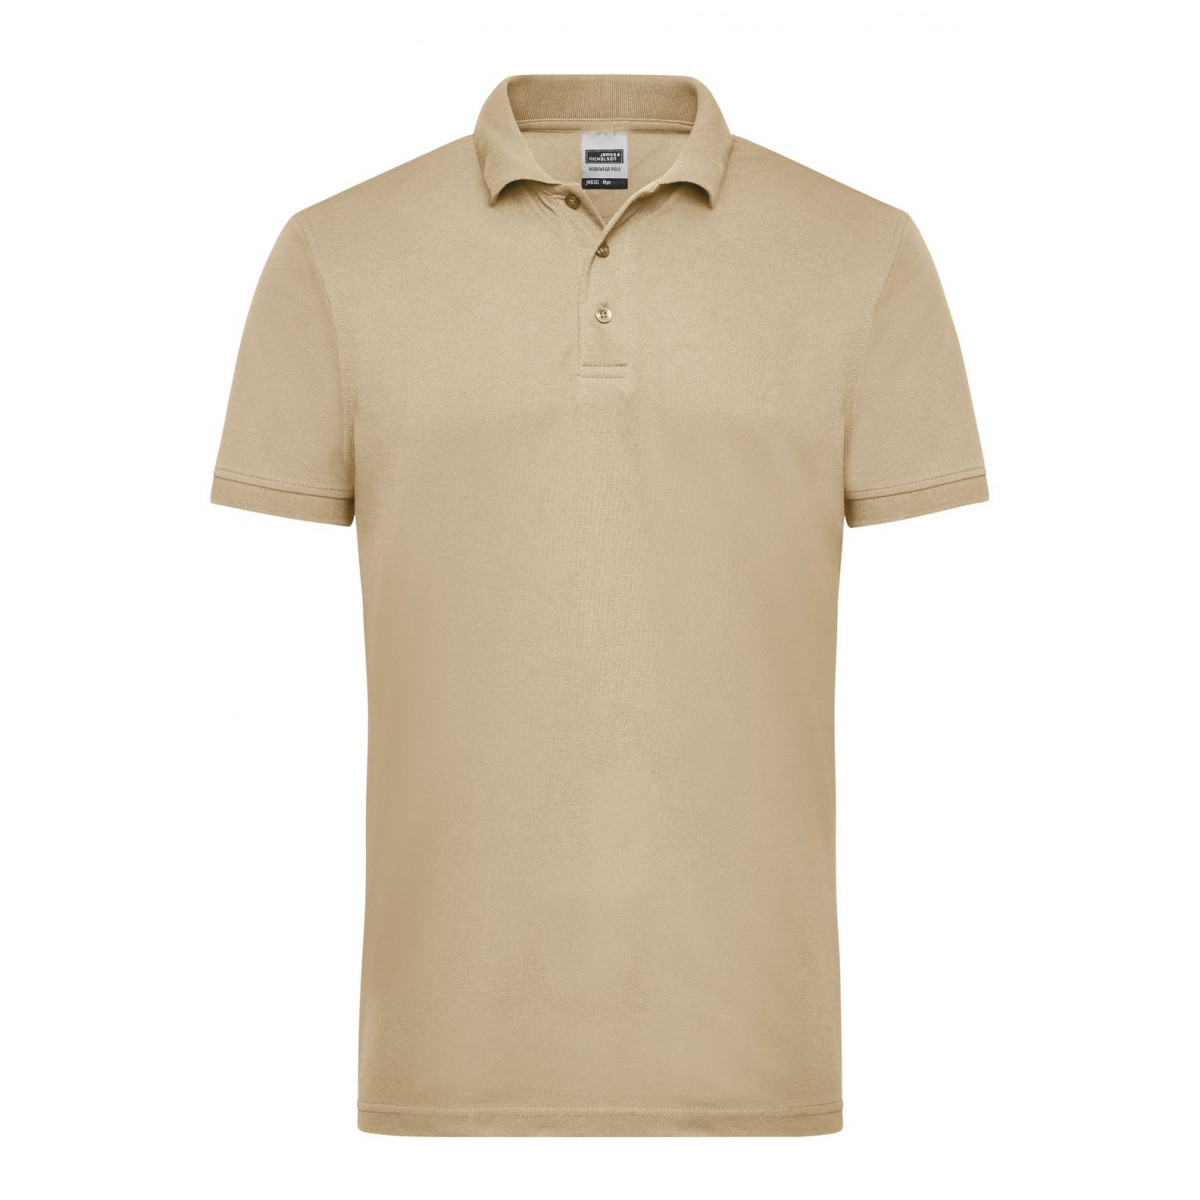 Рубашка поло мужская JN830 Mens Workwear Polo - Бежевый